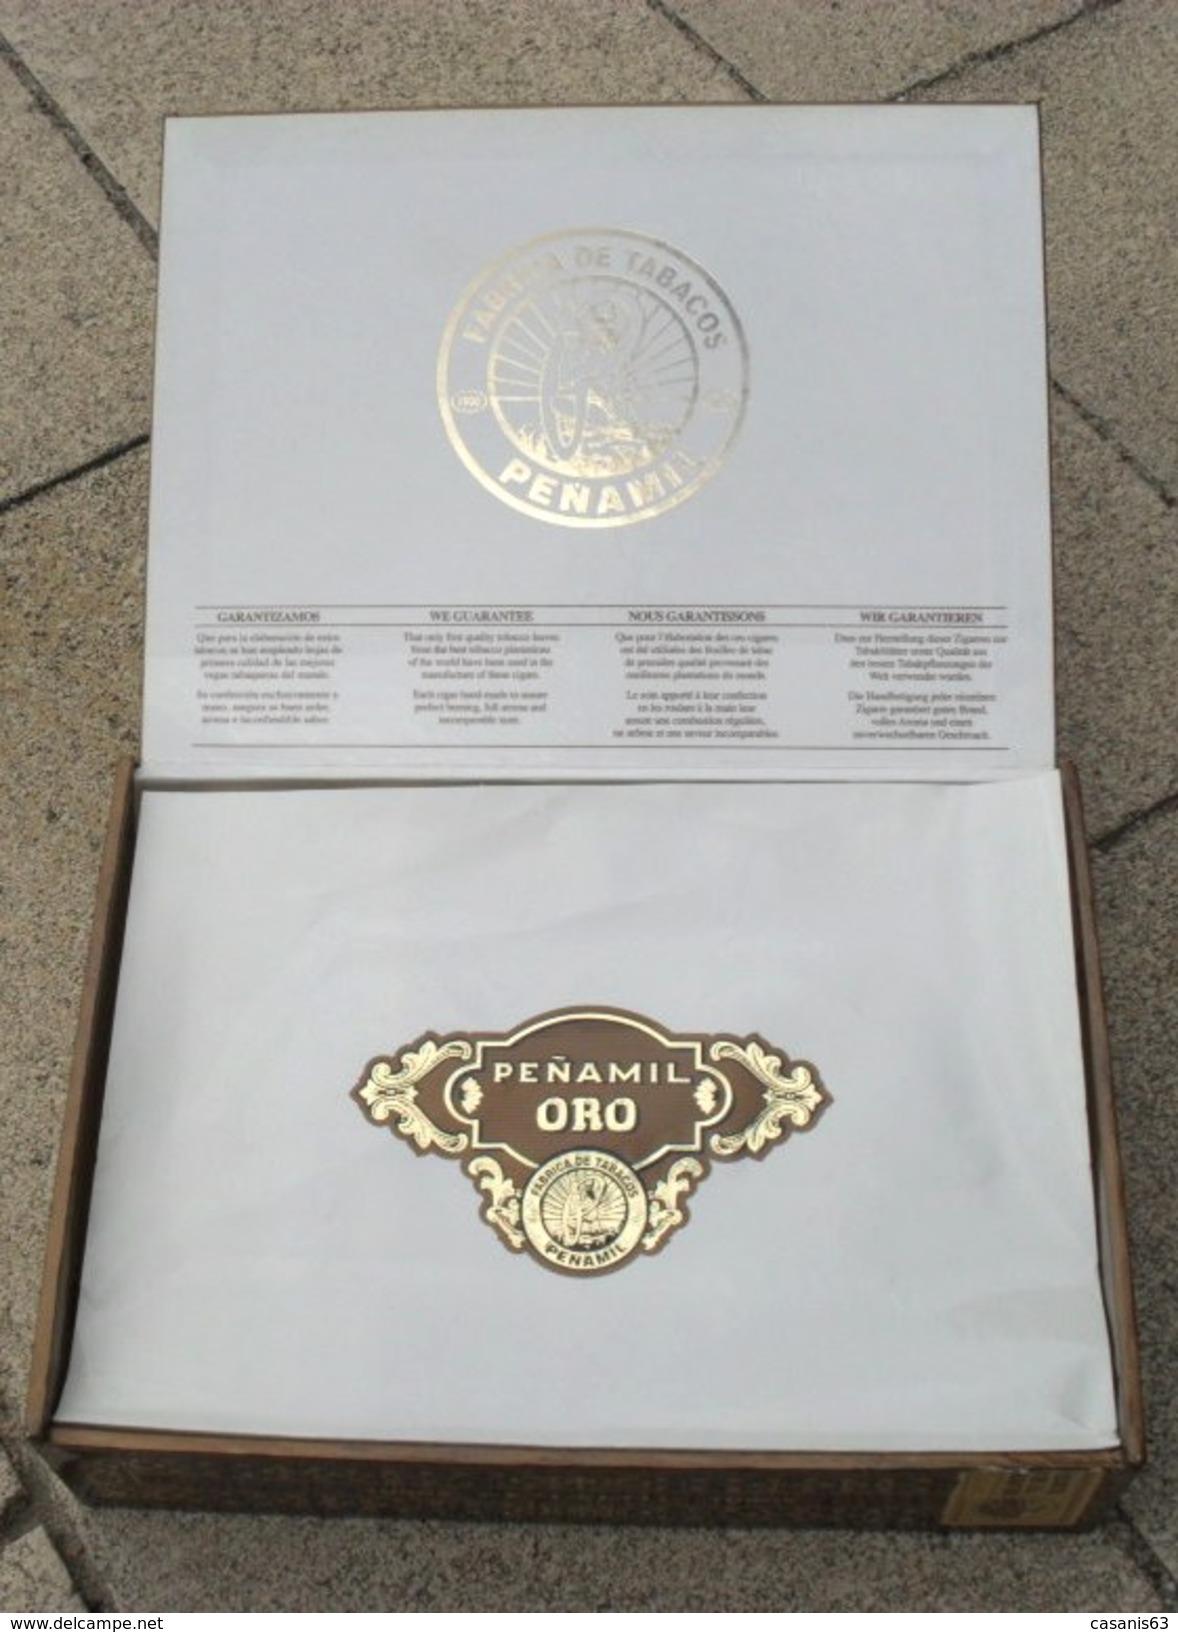 TABAC  )    BOITE  A  CIGARES  -    PENAMIL  -  ORO - Cigar Cases